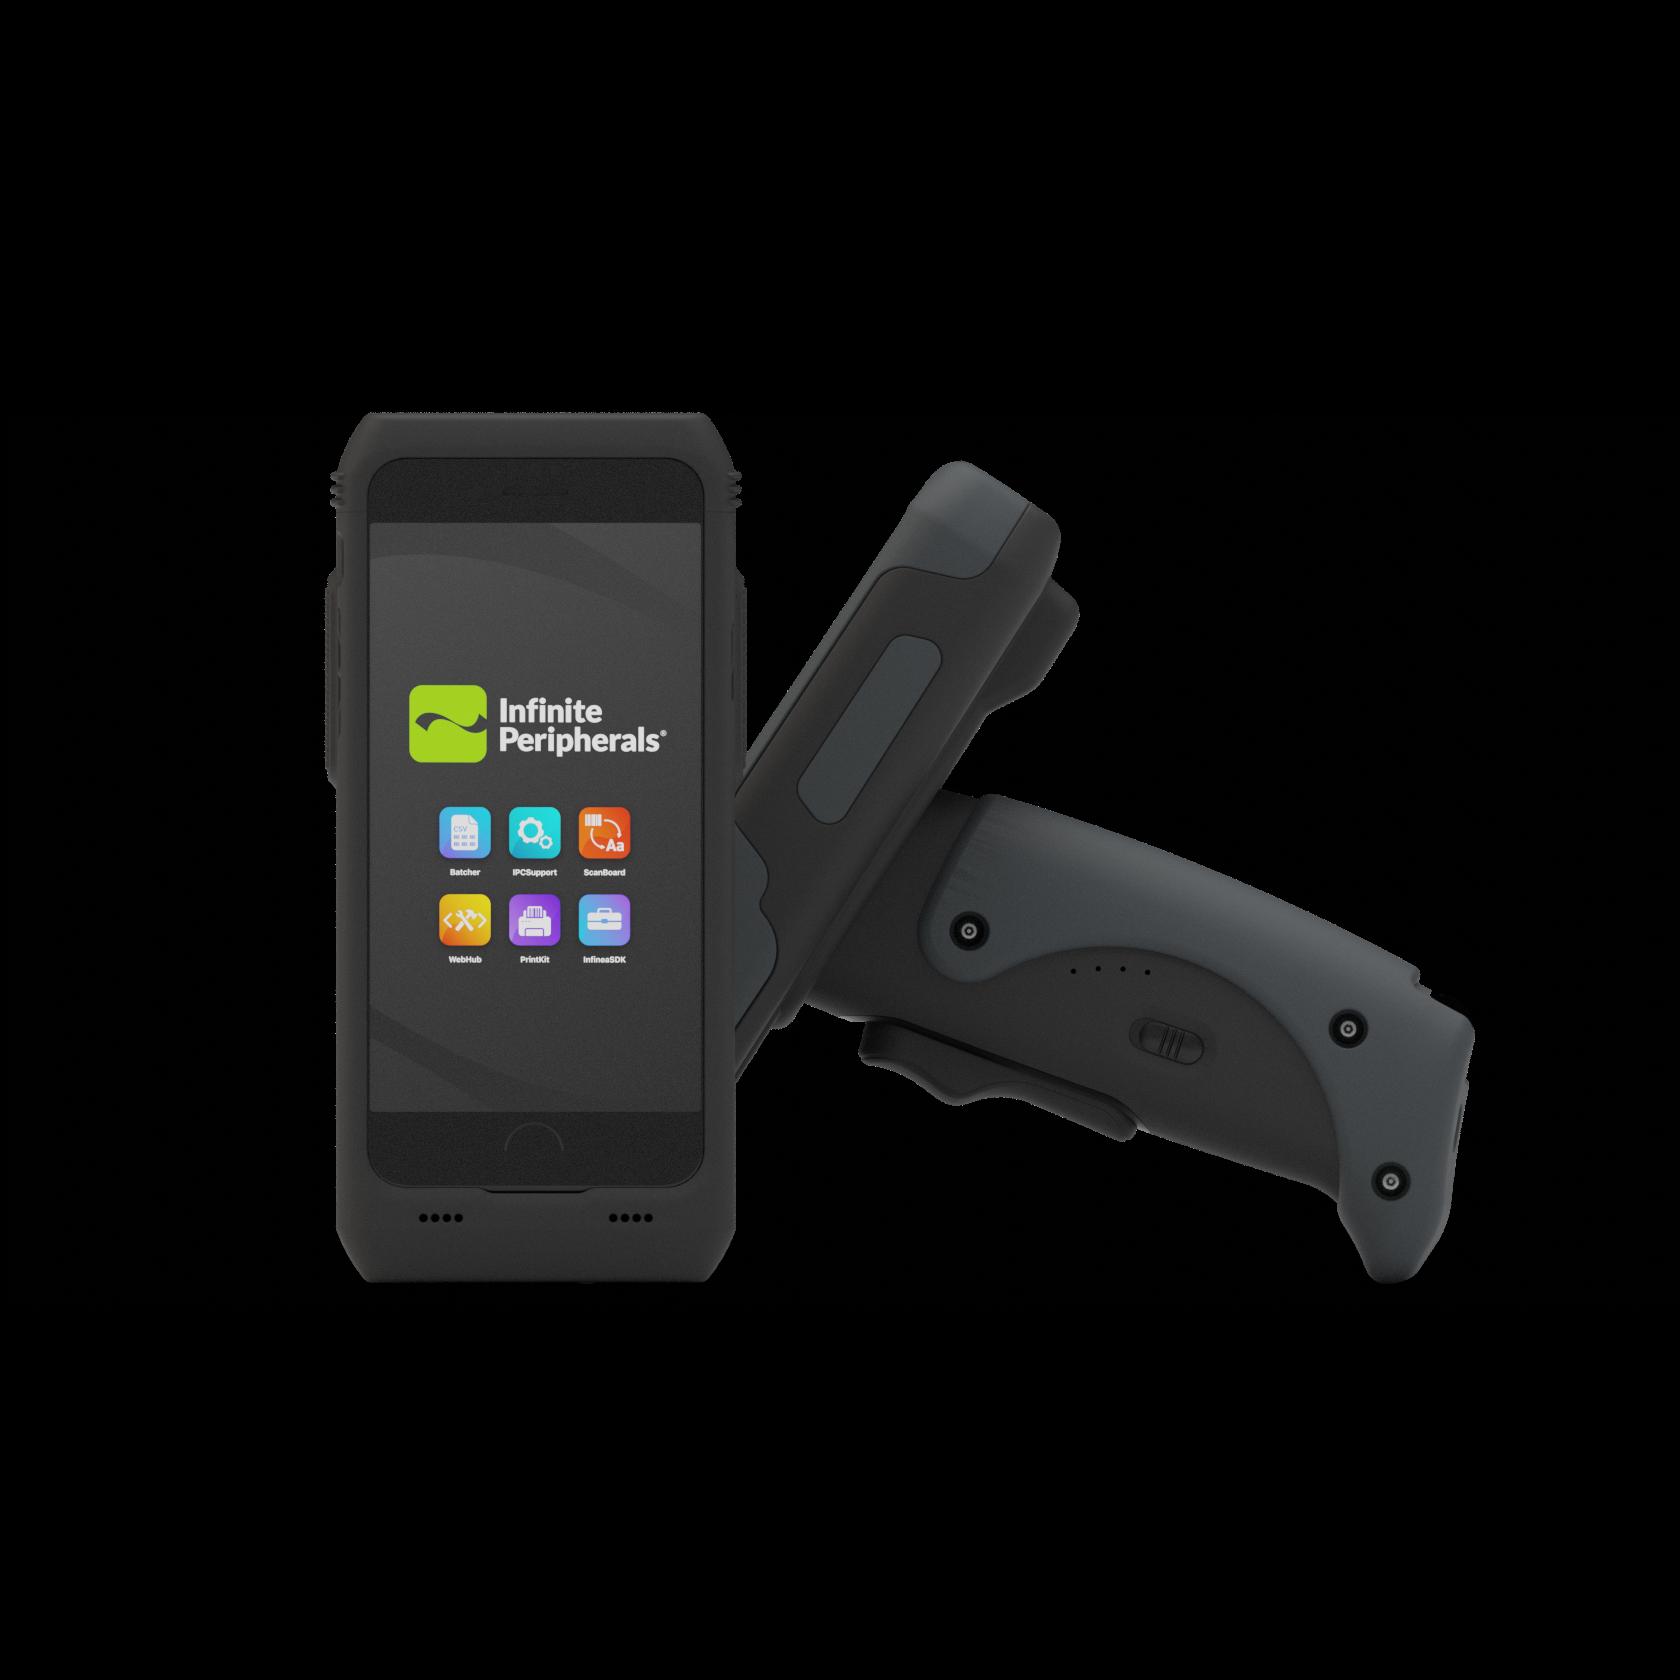 Linea Pro 7i and Pistol Grip